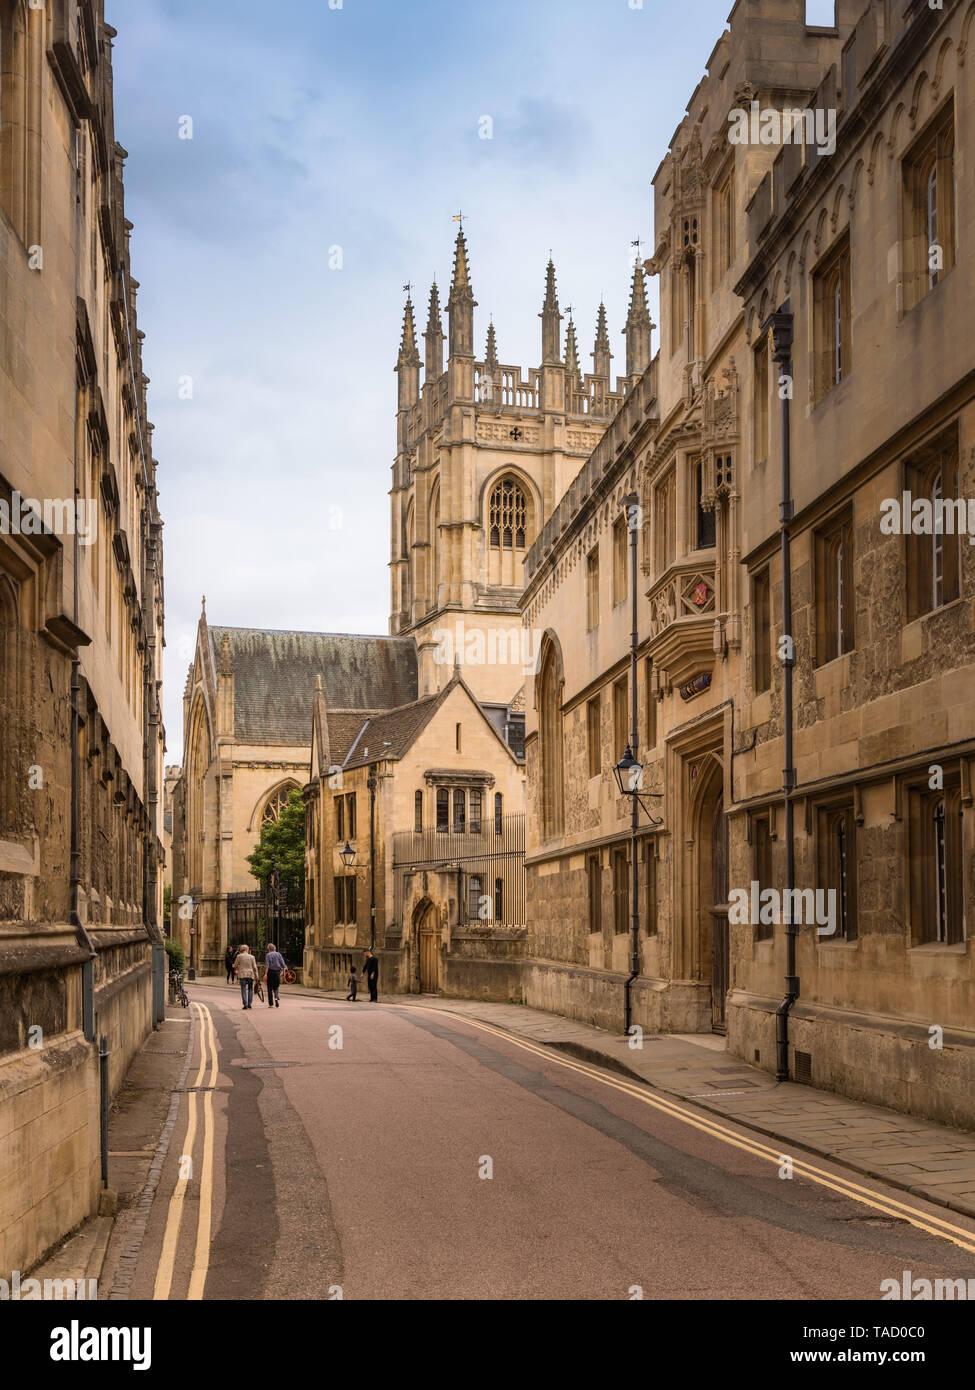 Merton Street, Oxford University, UK - Stock Image